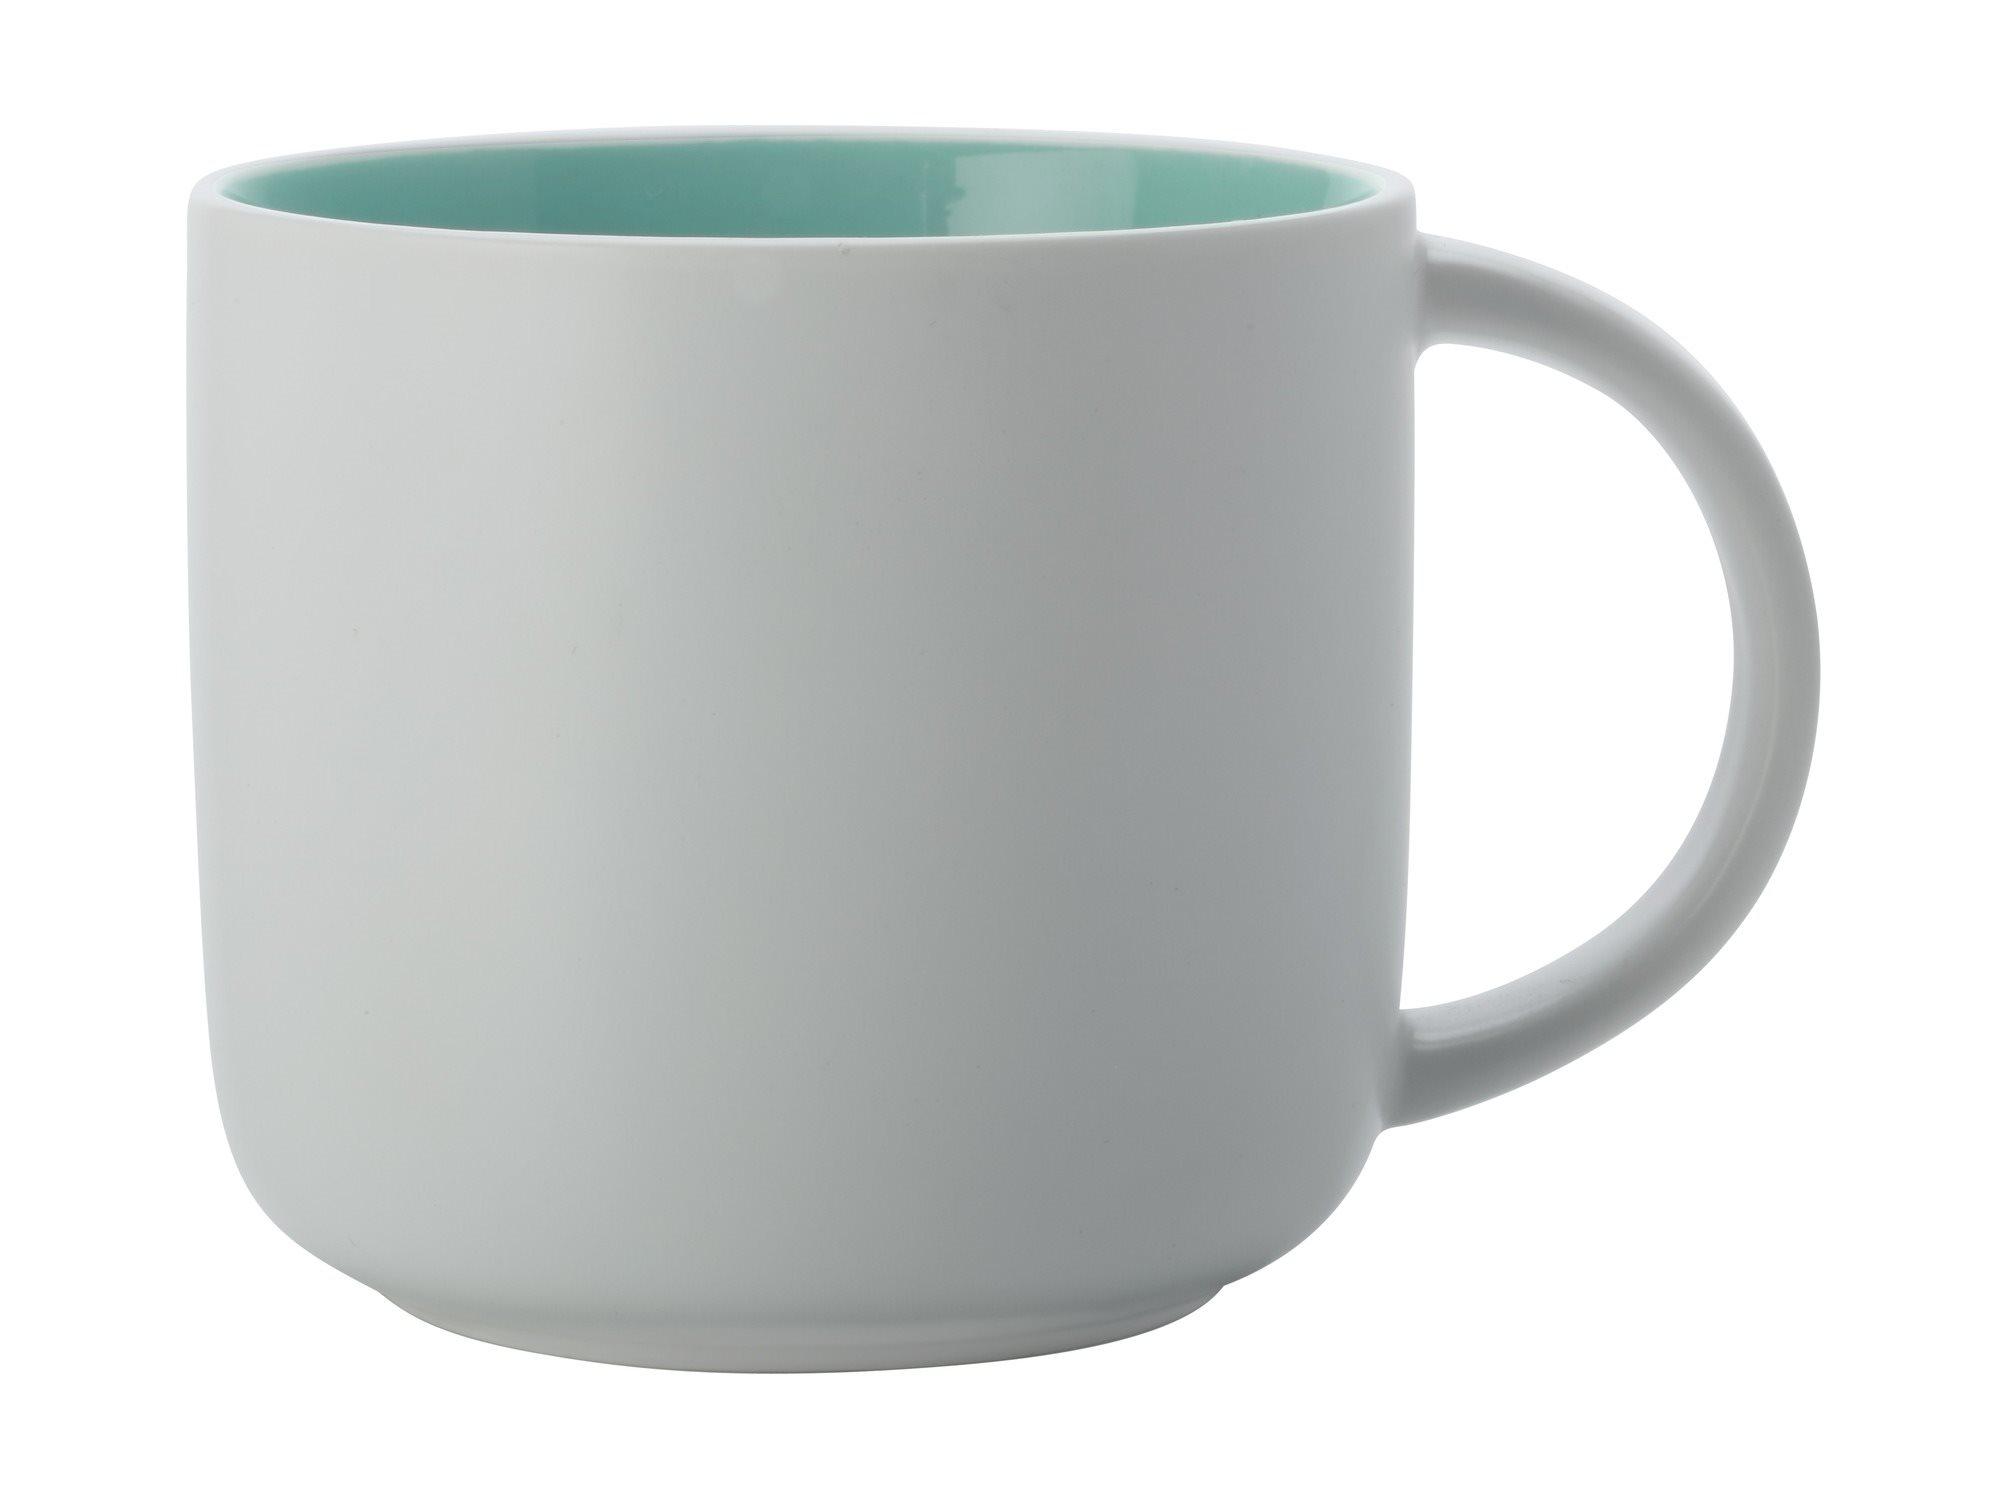 Maxwell & Williams Κούπα Τυρκουάζ Tint 440ml